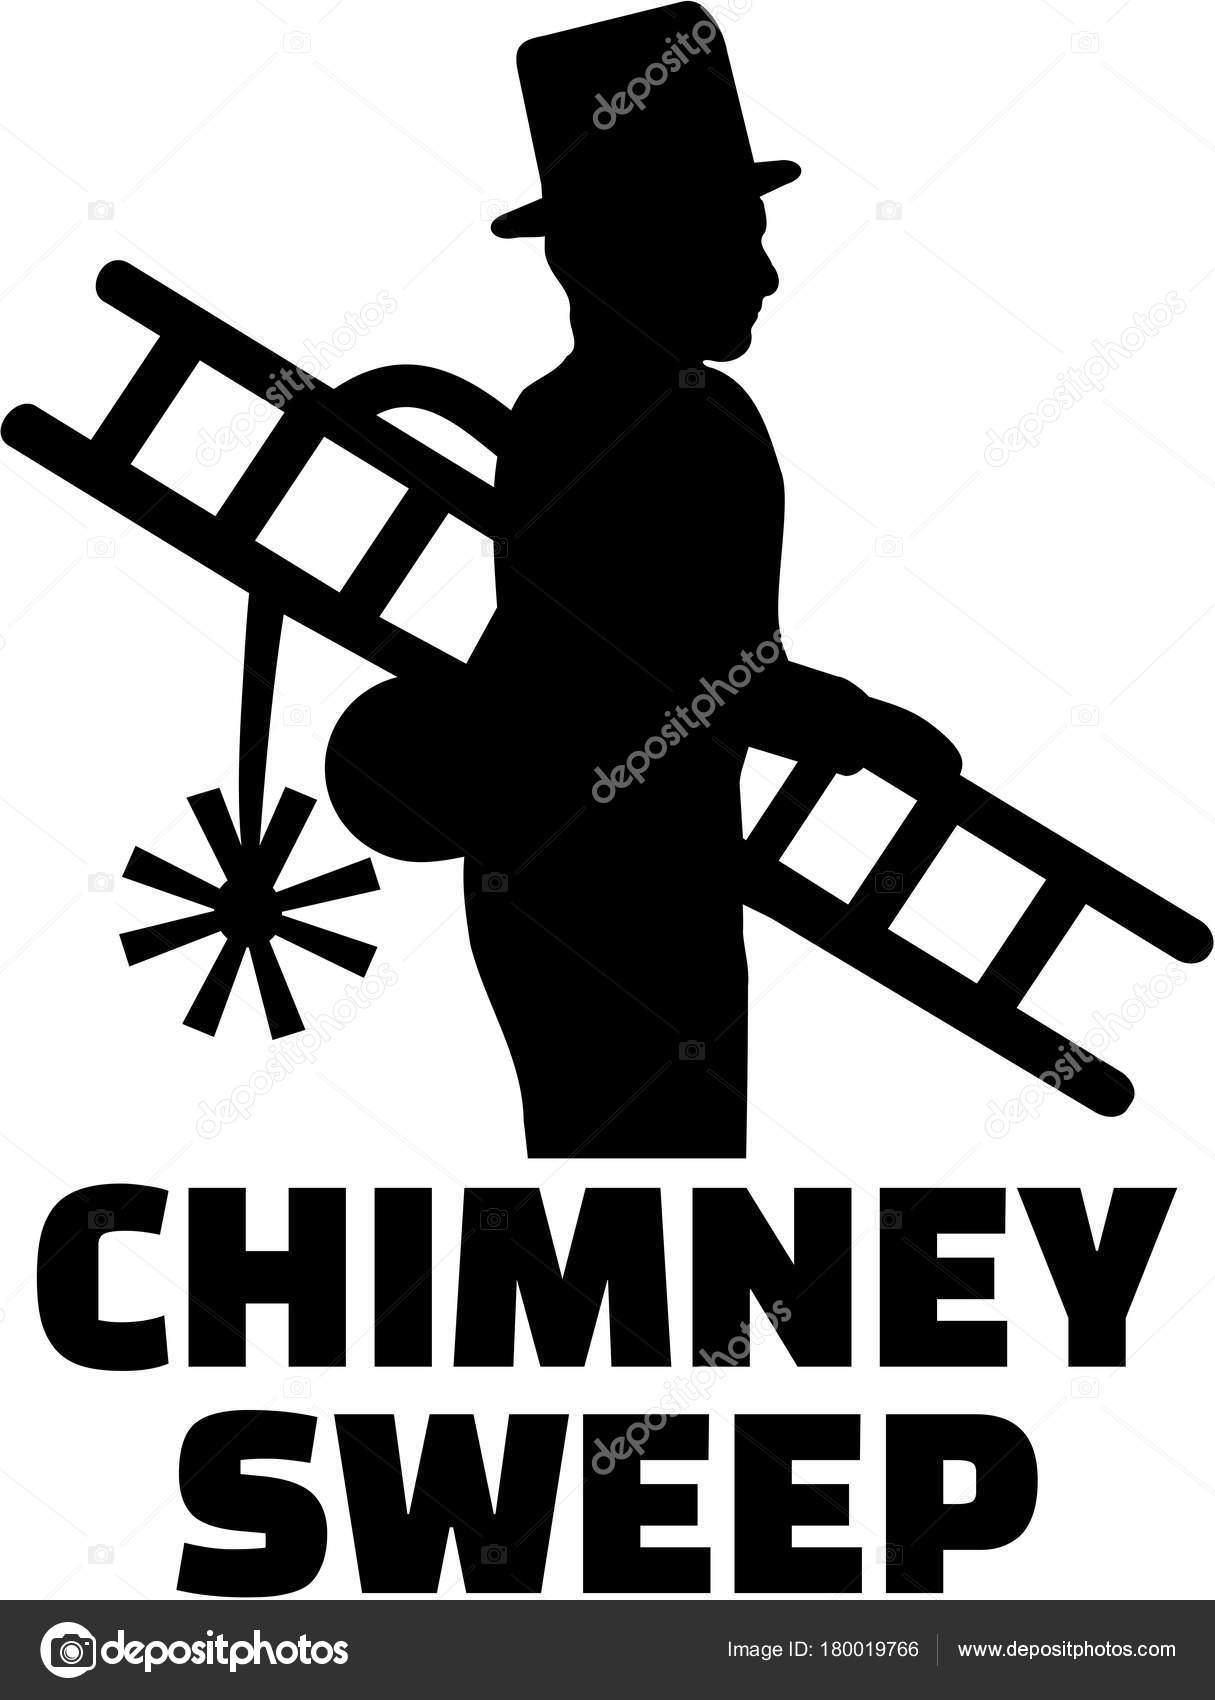 chimney sweep silhouette with job title stock vector miceking rh depositphotos com Free Vector Graphics Tree Vector